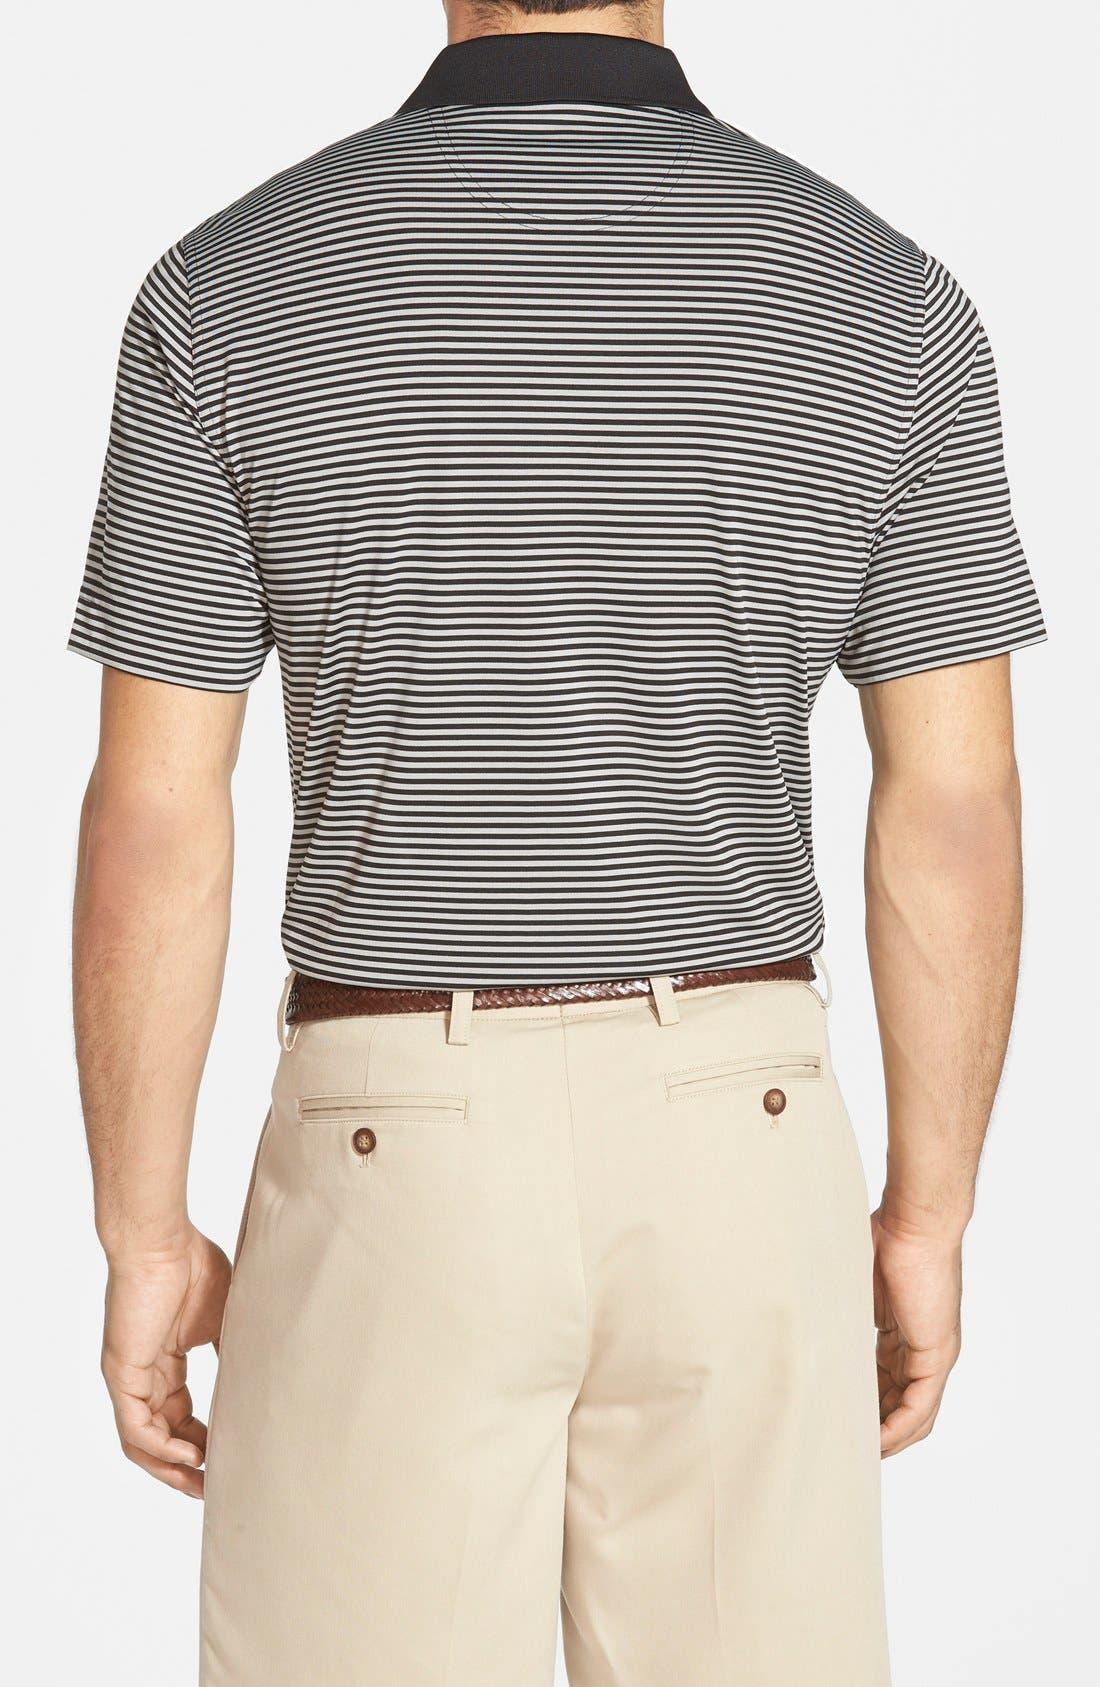 Alternate Image 2  - Cutter & Buck 'Trevor' Stripe DryTec Polo (Regular & Big)